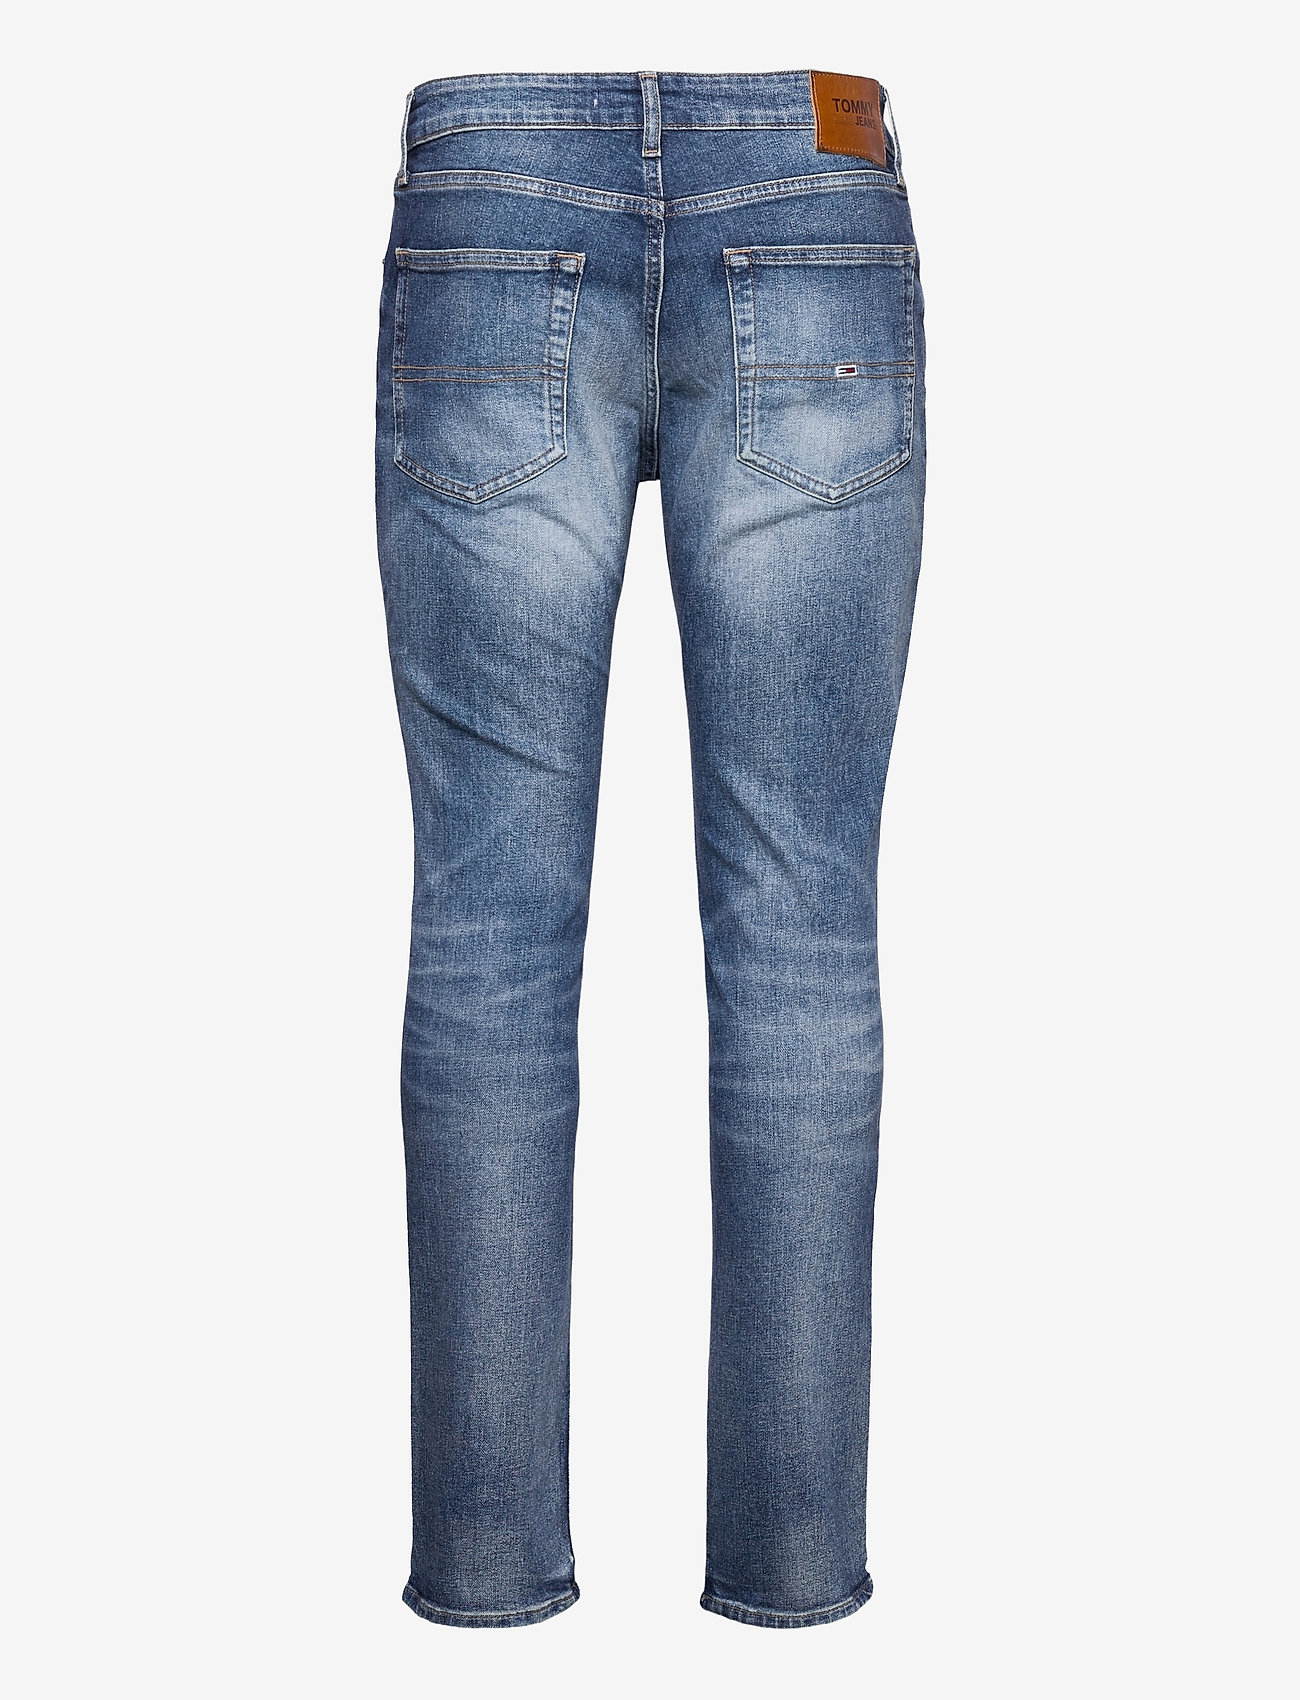 Tommy Jeans - SCANTON SLIM DSYC - slim jeans - dean six years com - 1